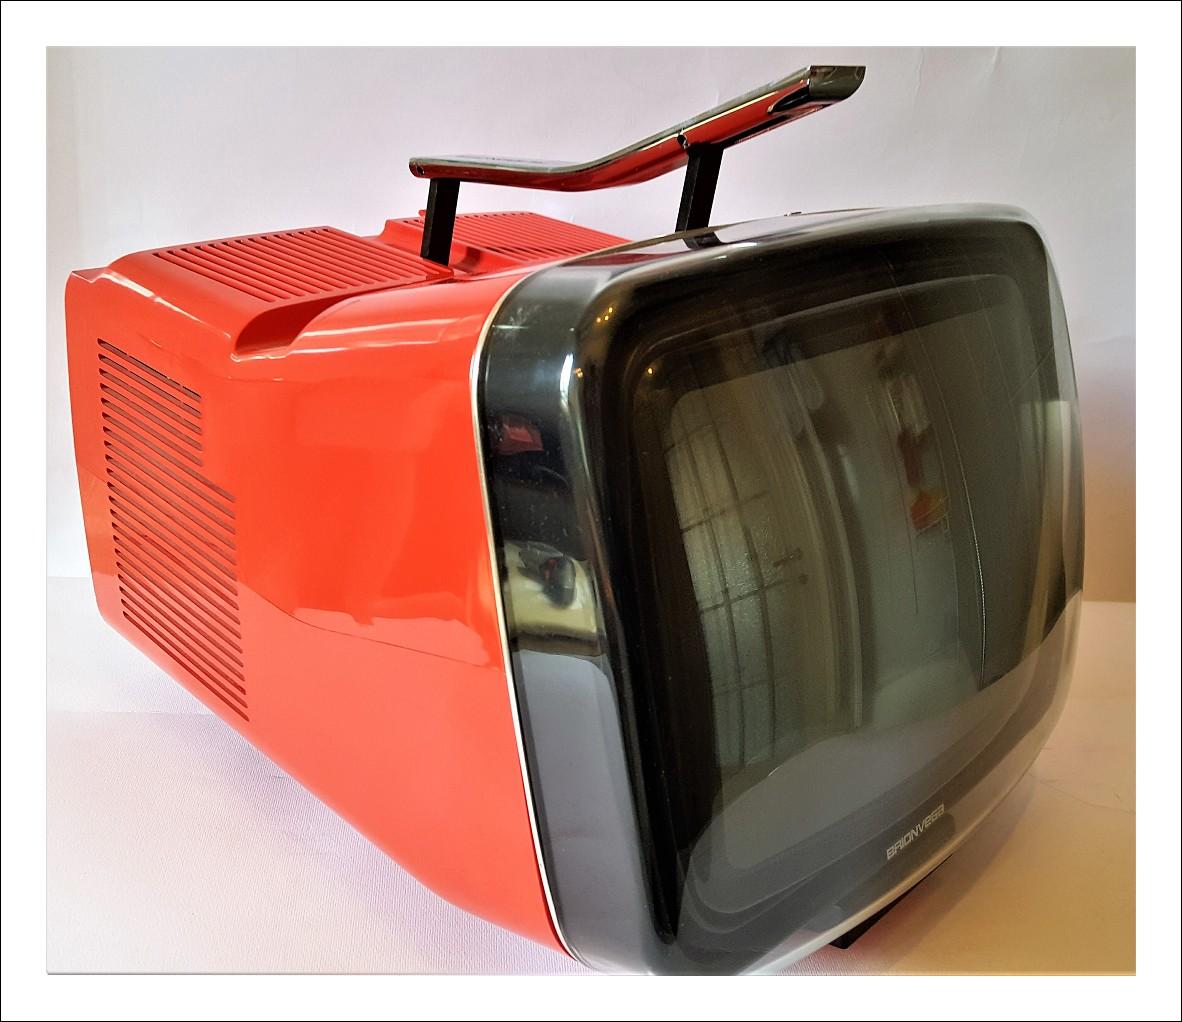 Televisore brionvega algol 11' rosso